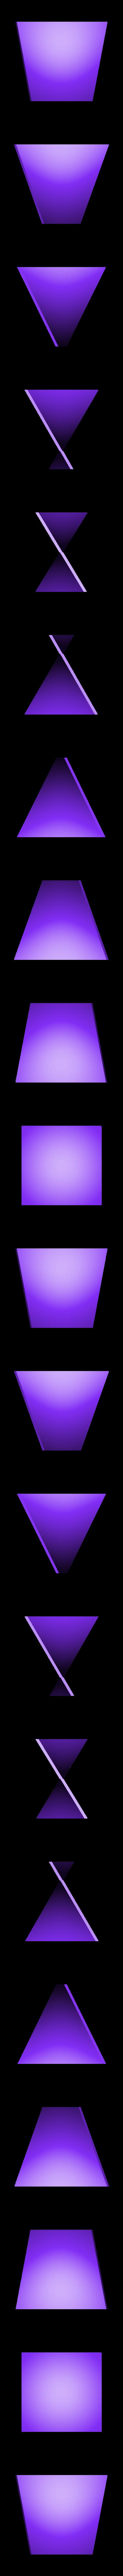 surface paraboloide 3dup.stl Download STL file Hyperbolic paraboloid surface • 3D printable model, 3dup_bzh